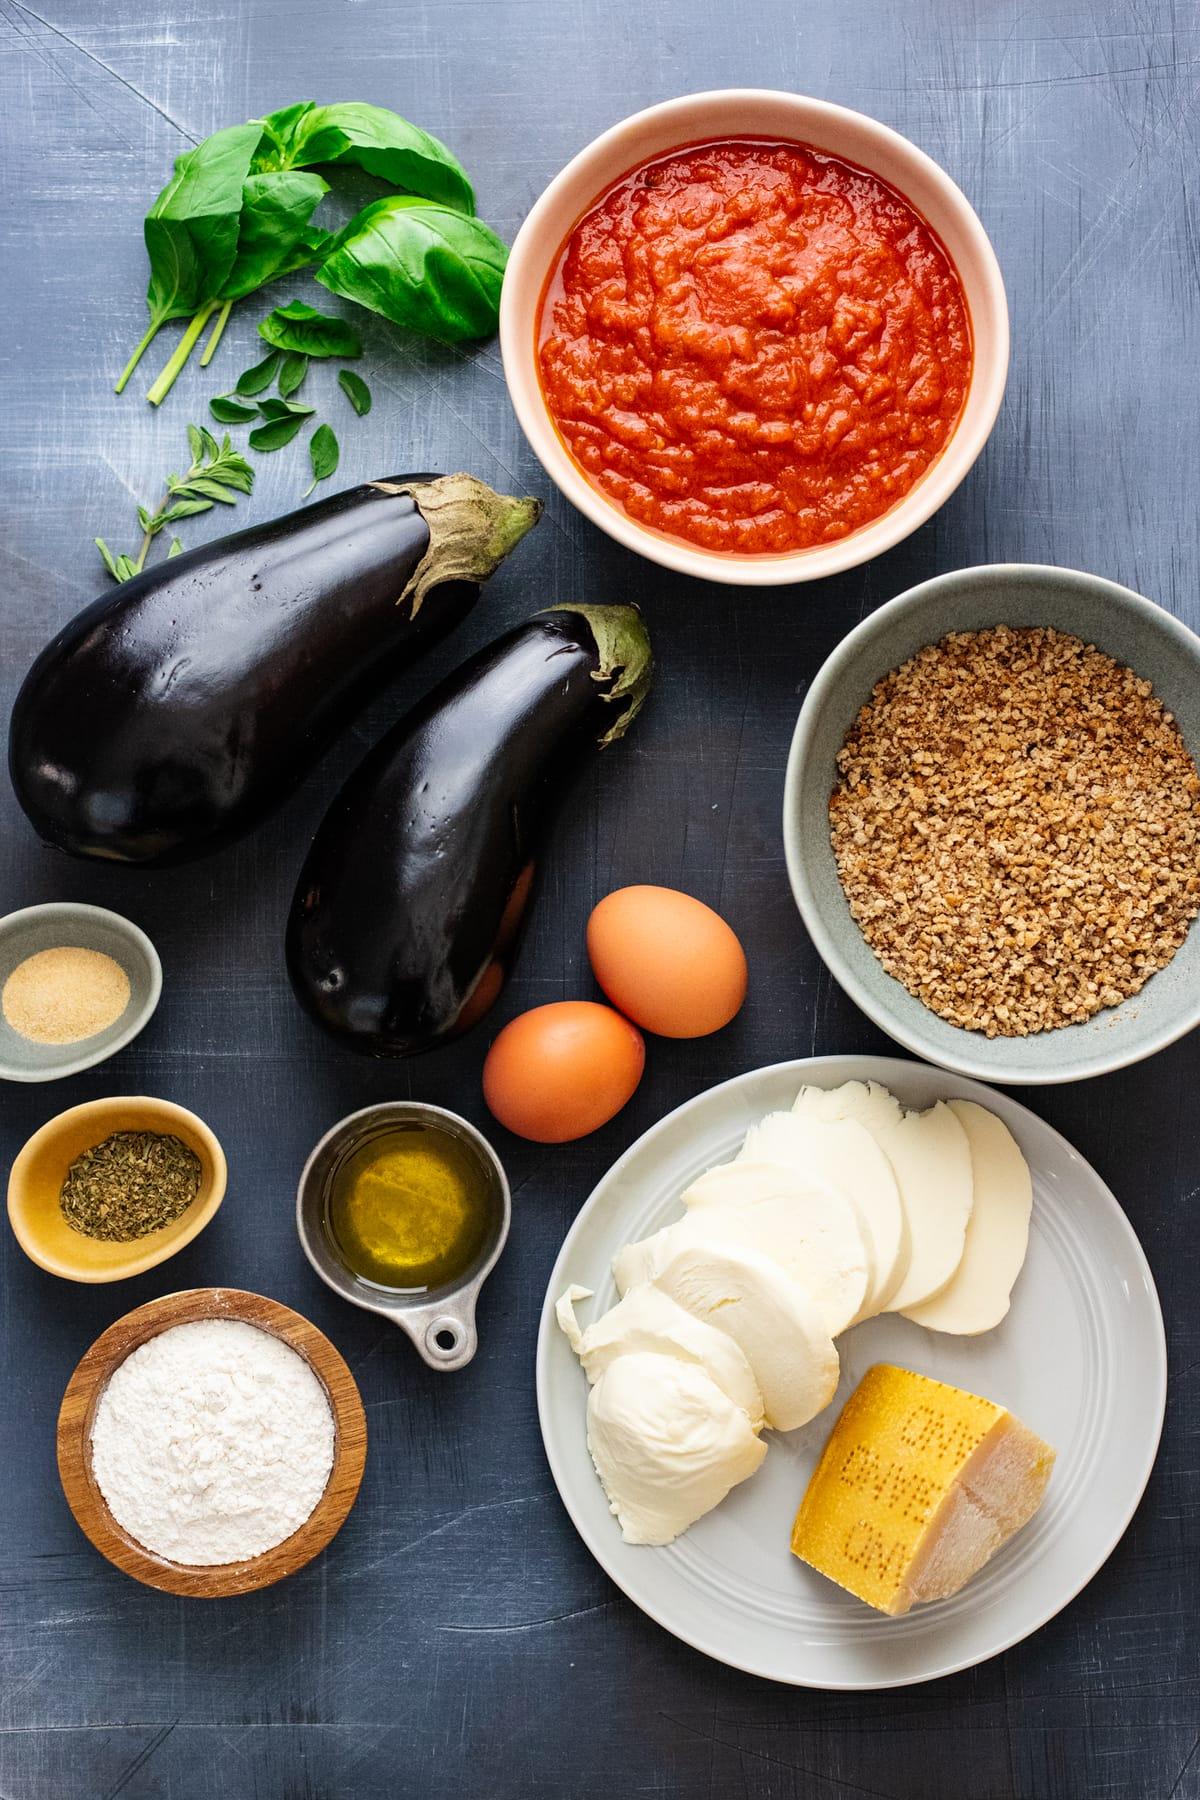 Ingredients for eggplant parmesan arranged on dark gray background.